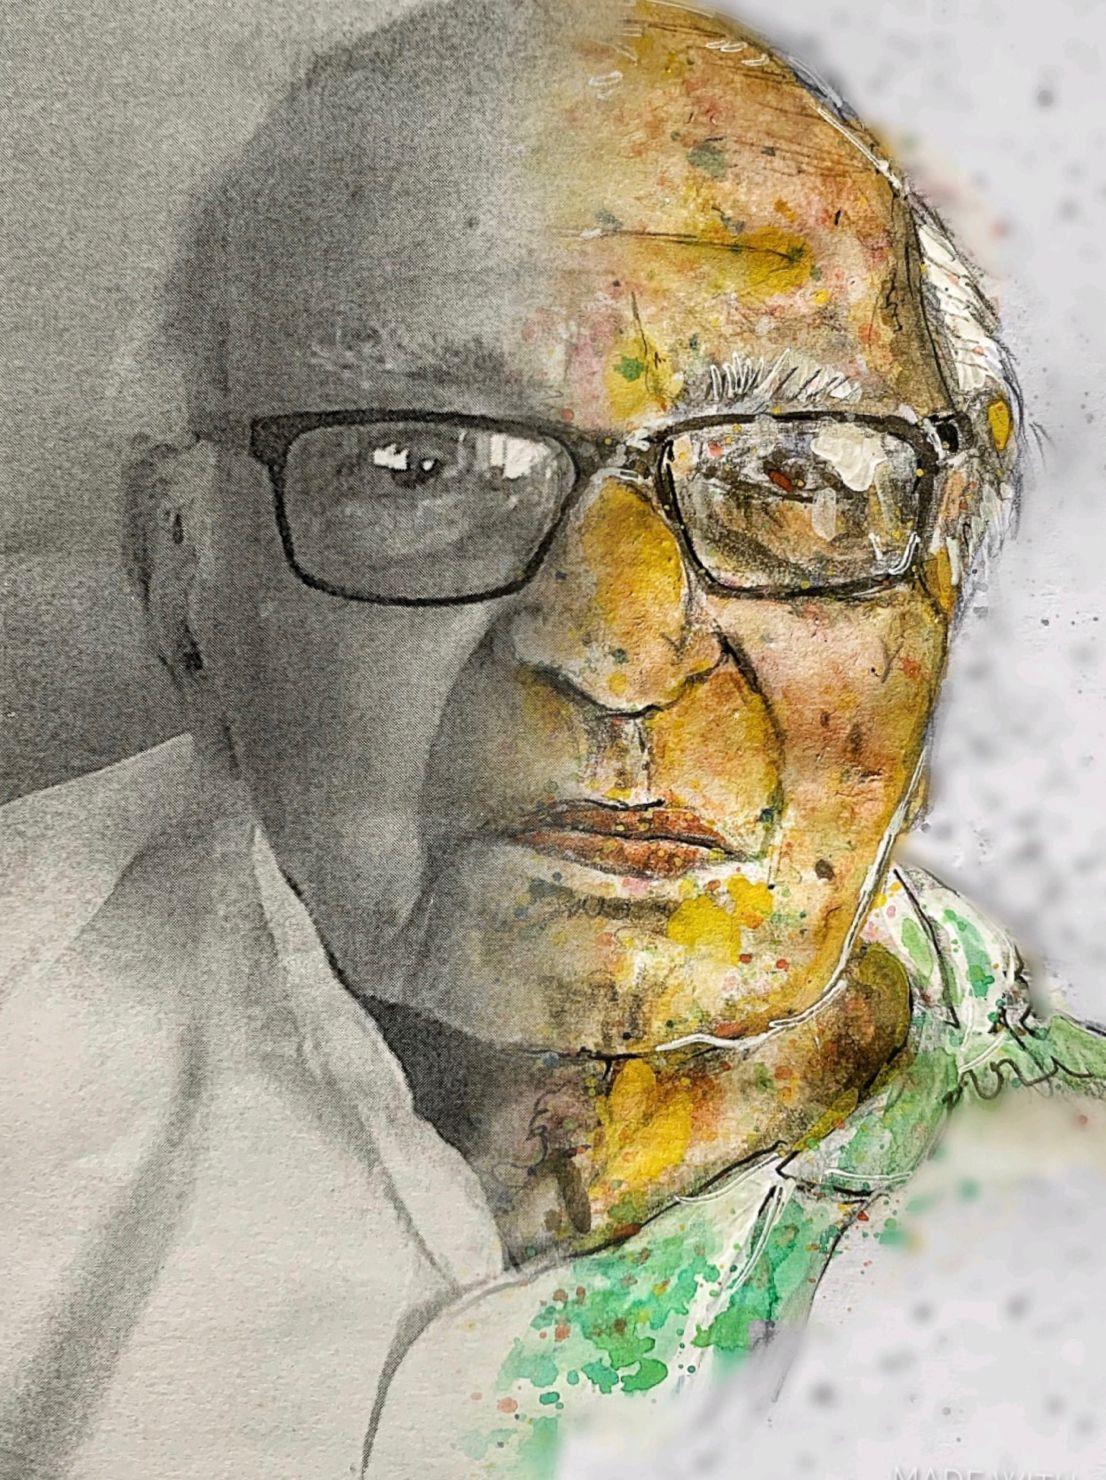 By Dr. Mohit Bhandari